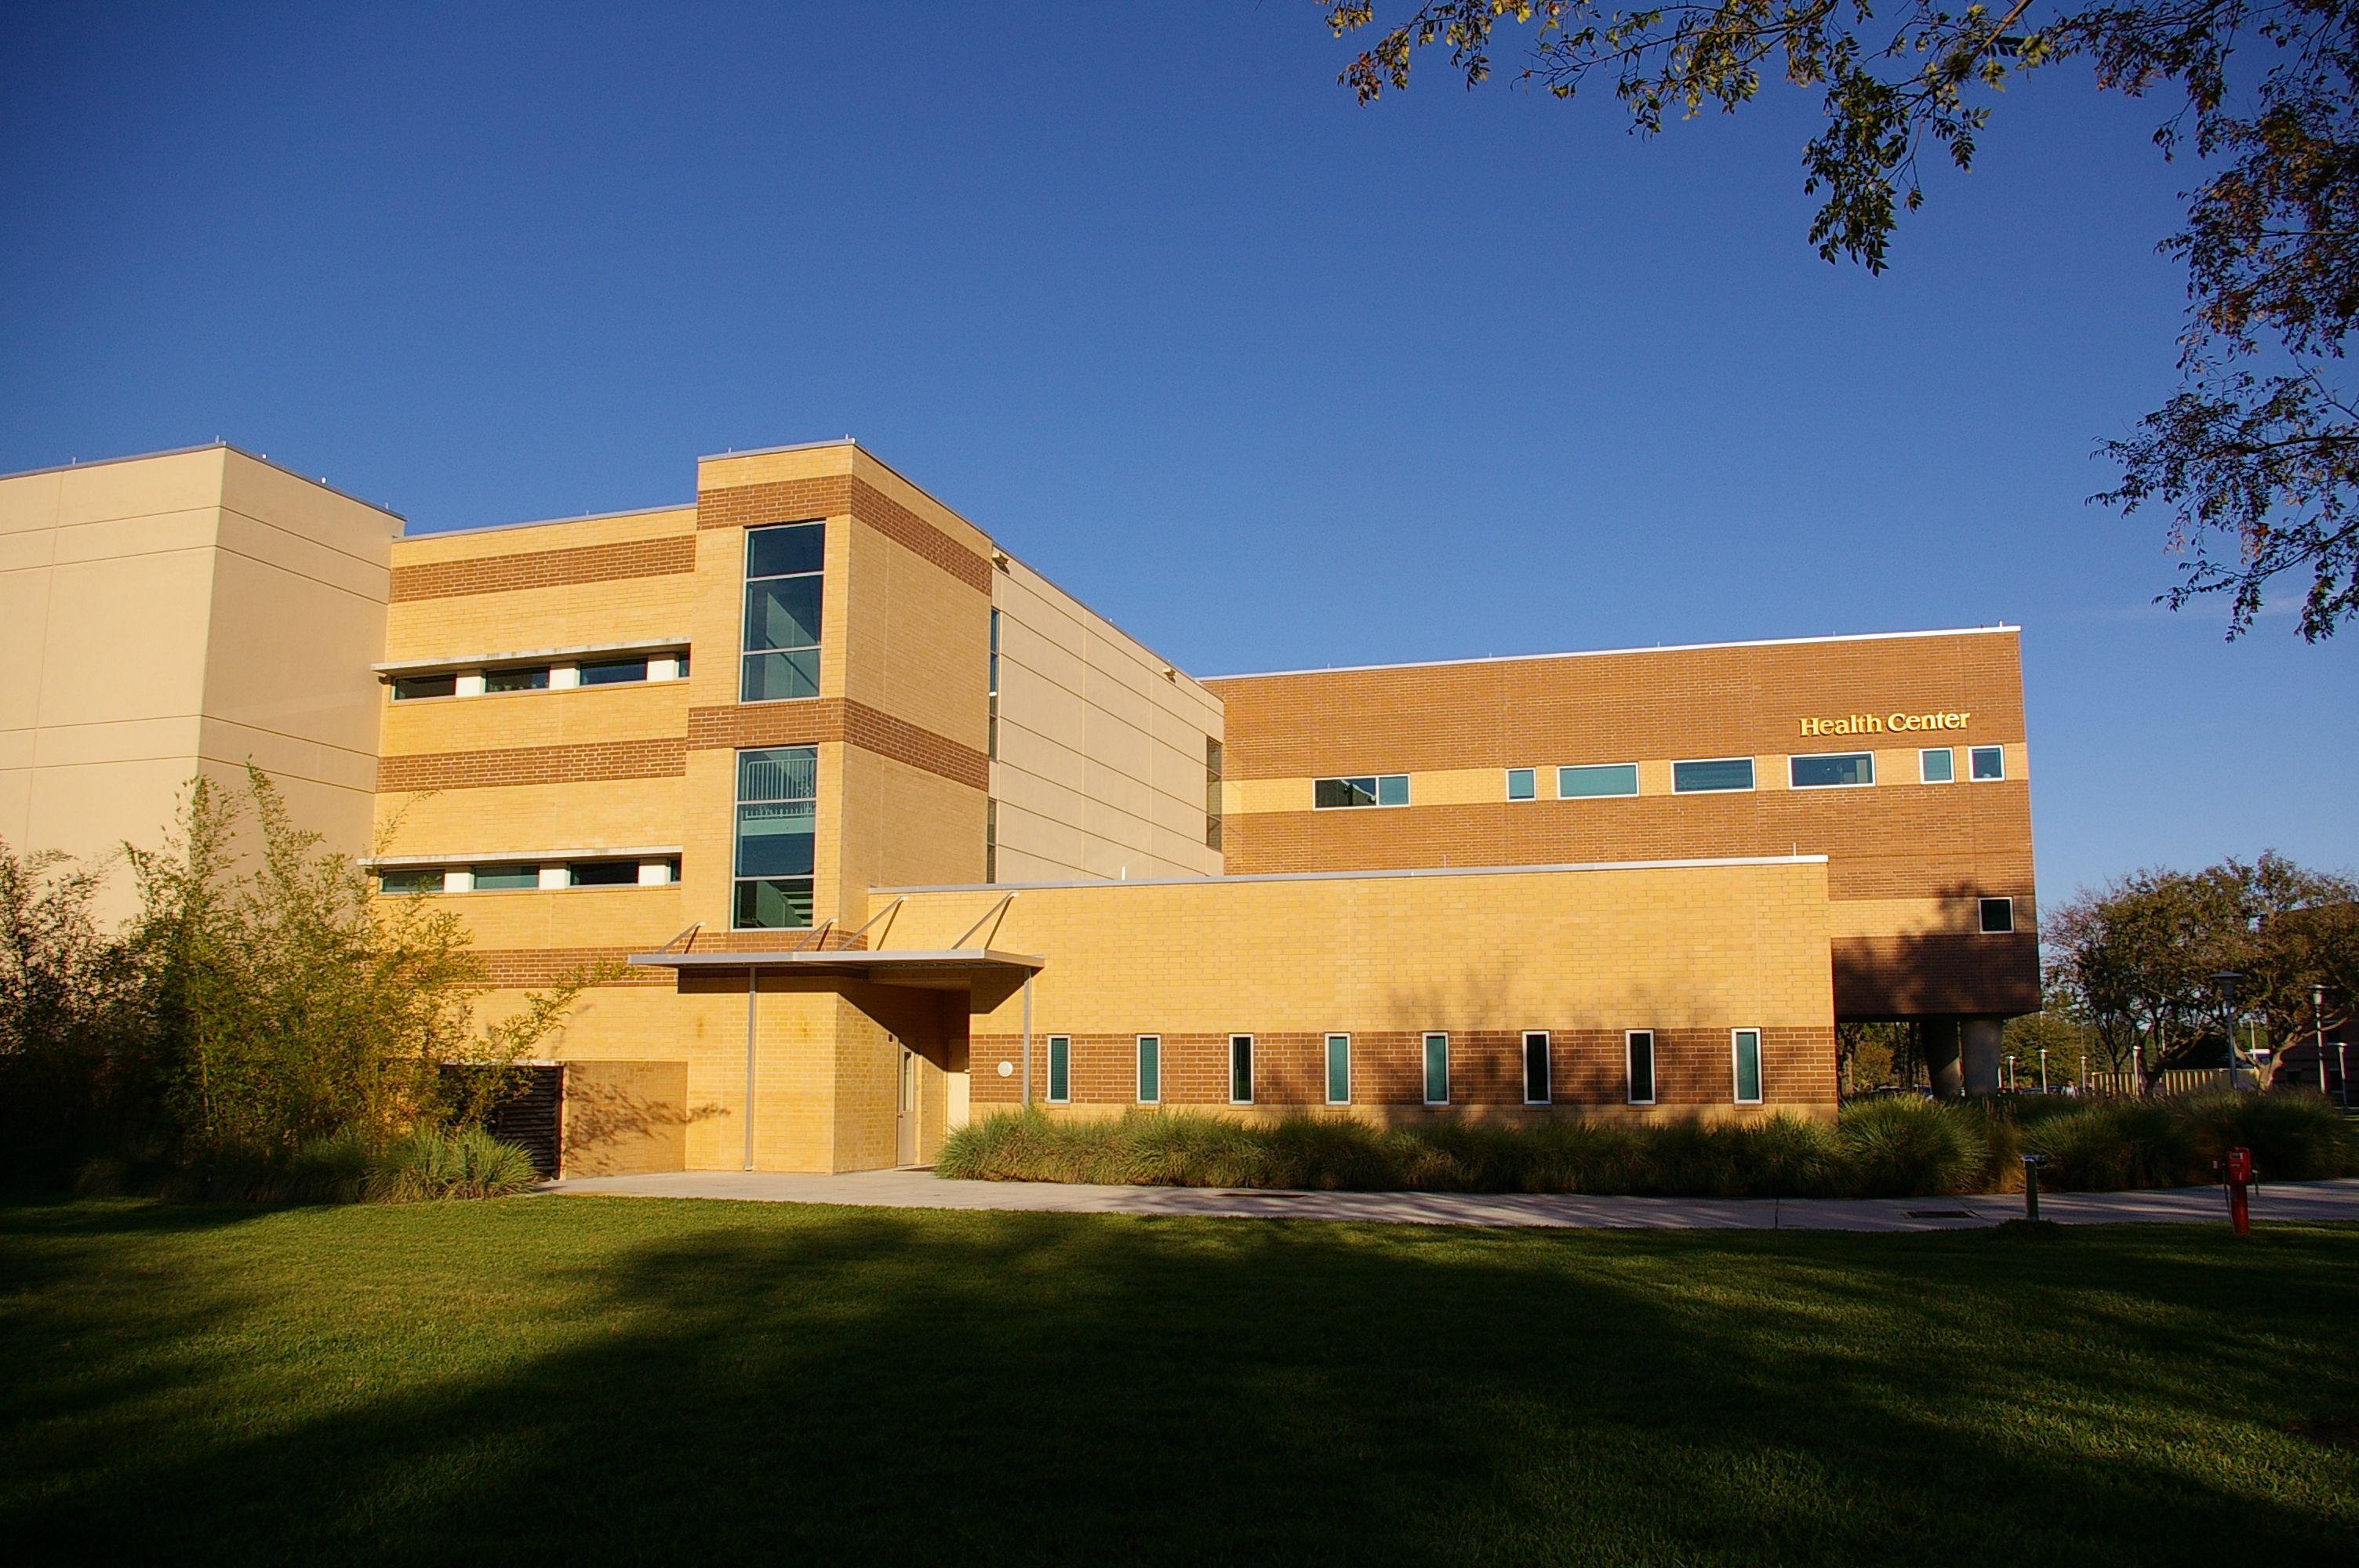 Ucf Campus Health Center on the U...